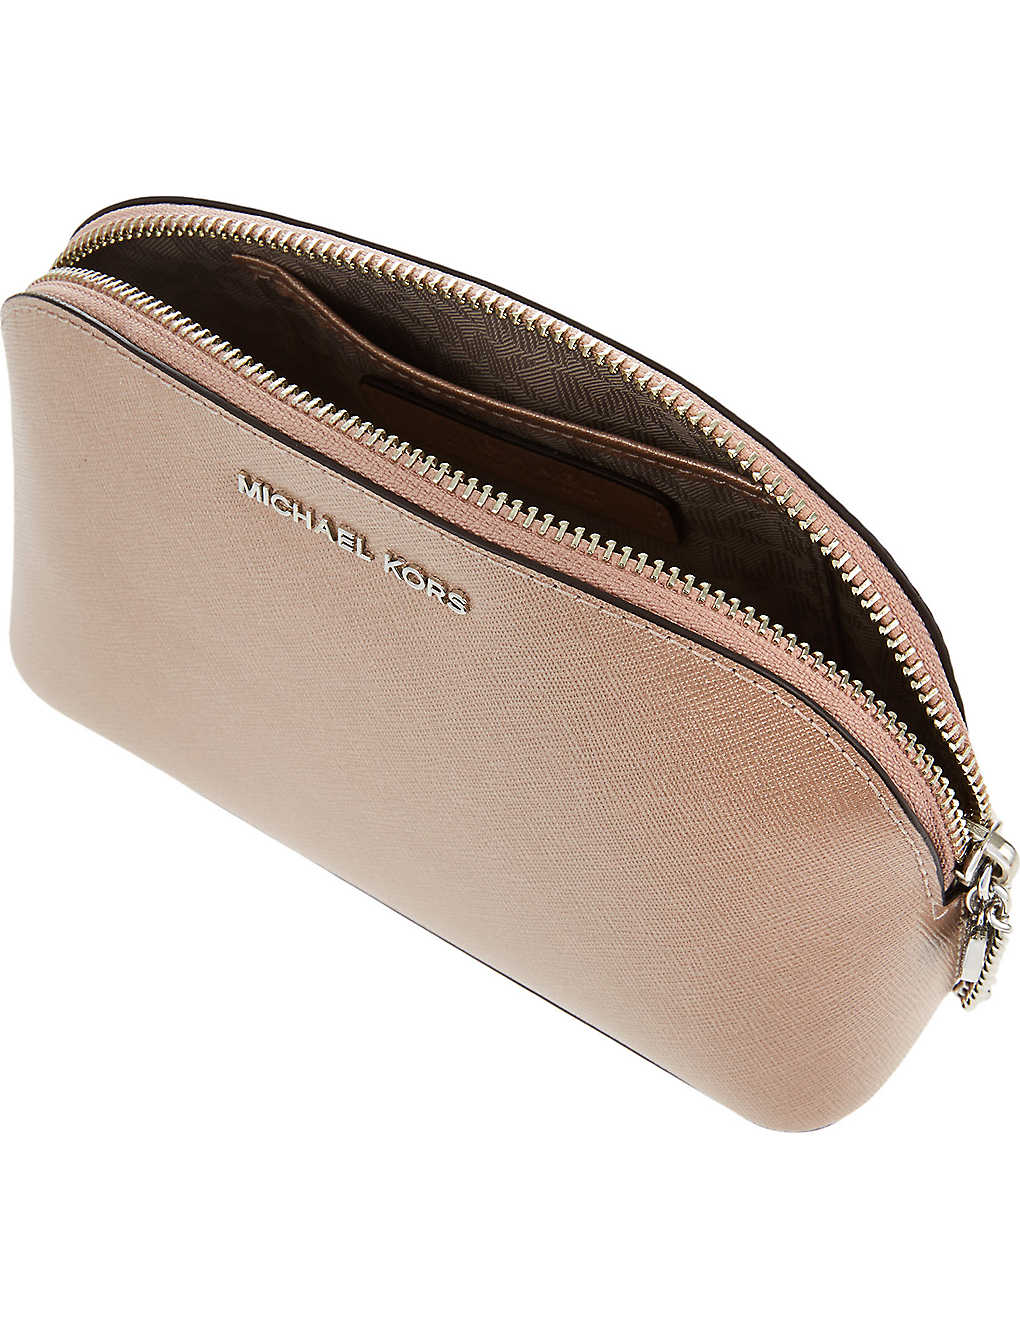 fa89cd277b5c96 MICHAEL MICHAEL KORS - Alex saffiano leather travel pouch ...